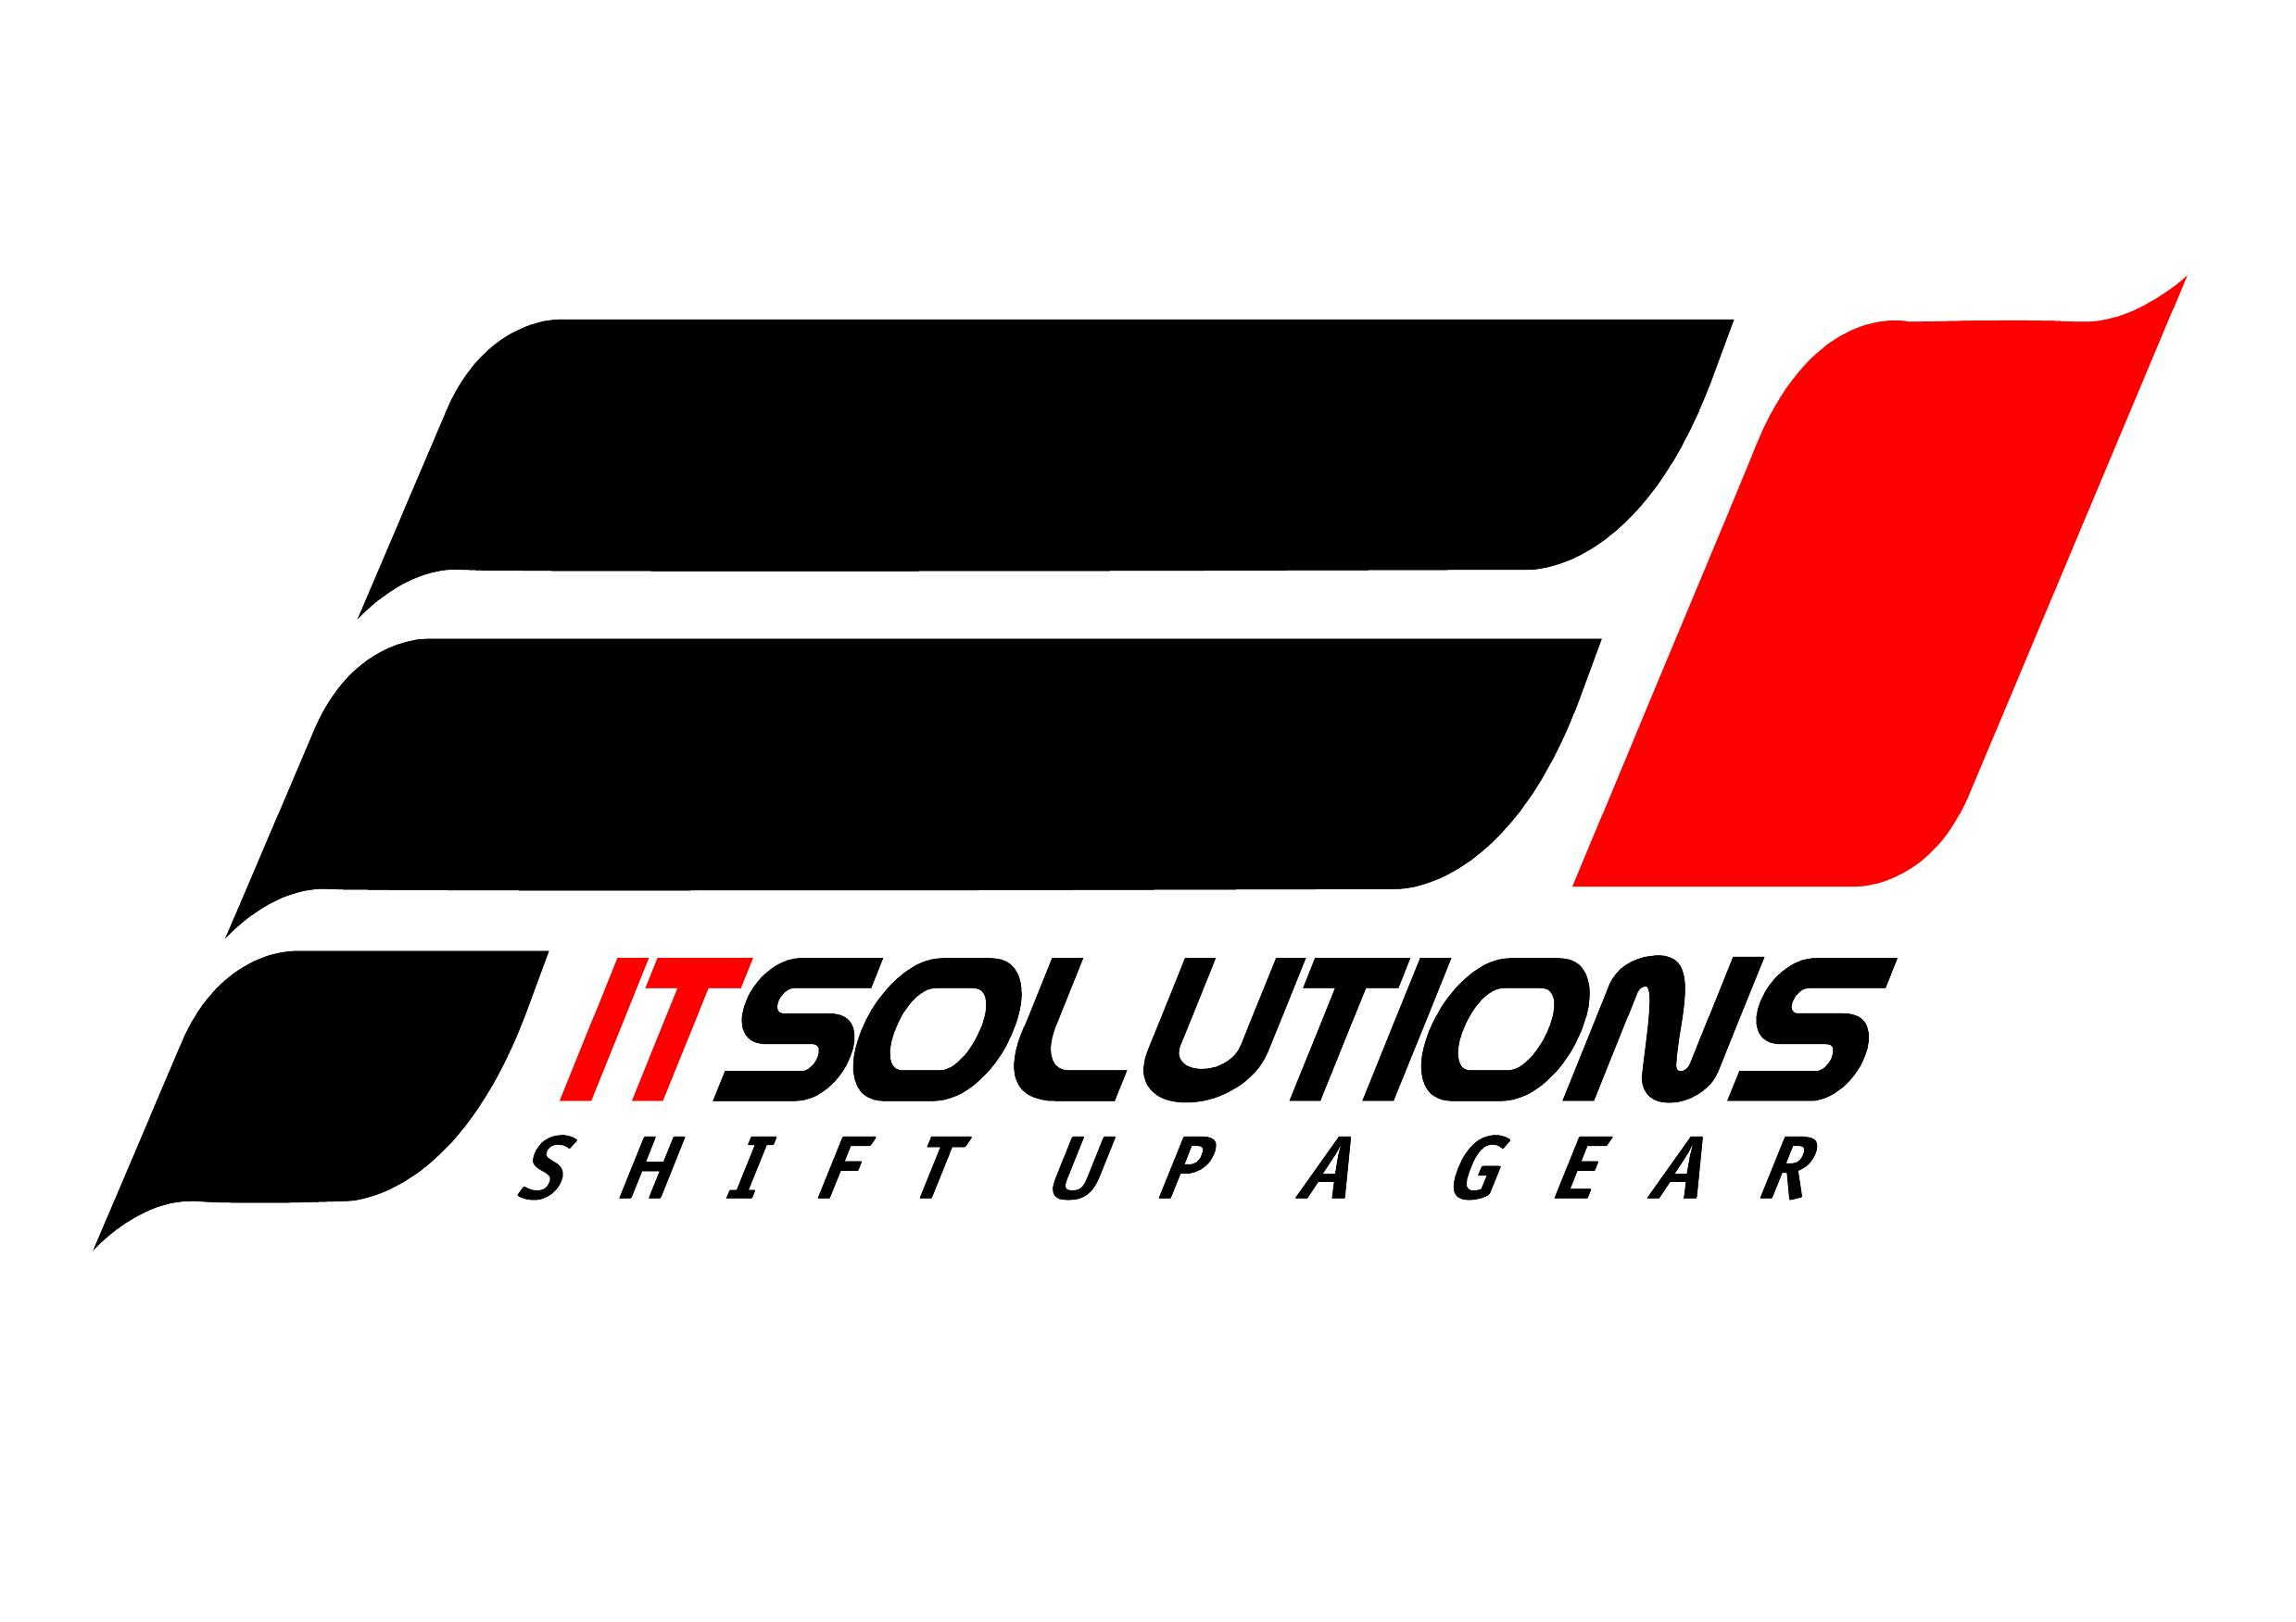 F1 IT Solutions